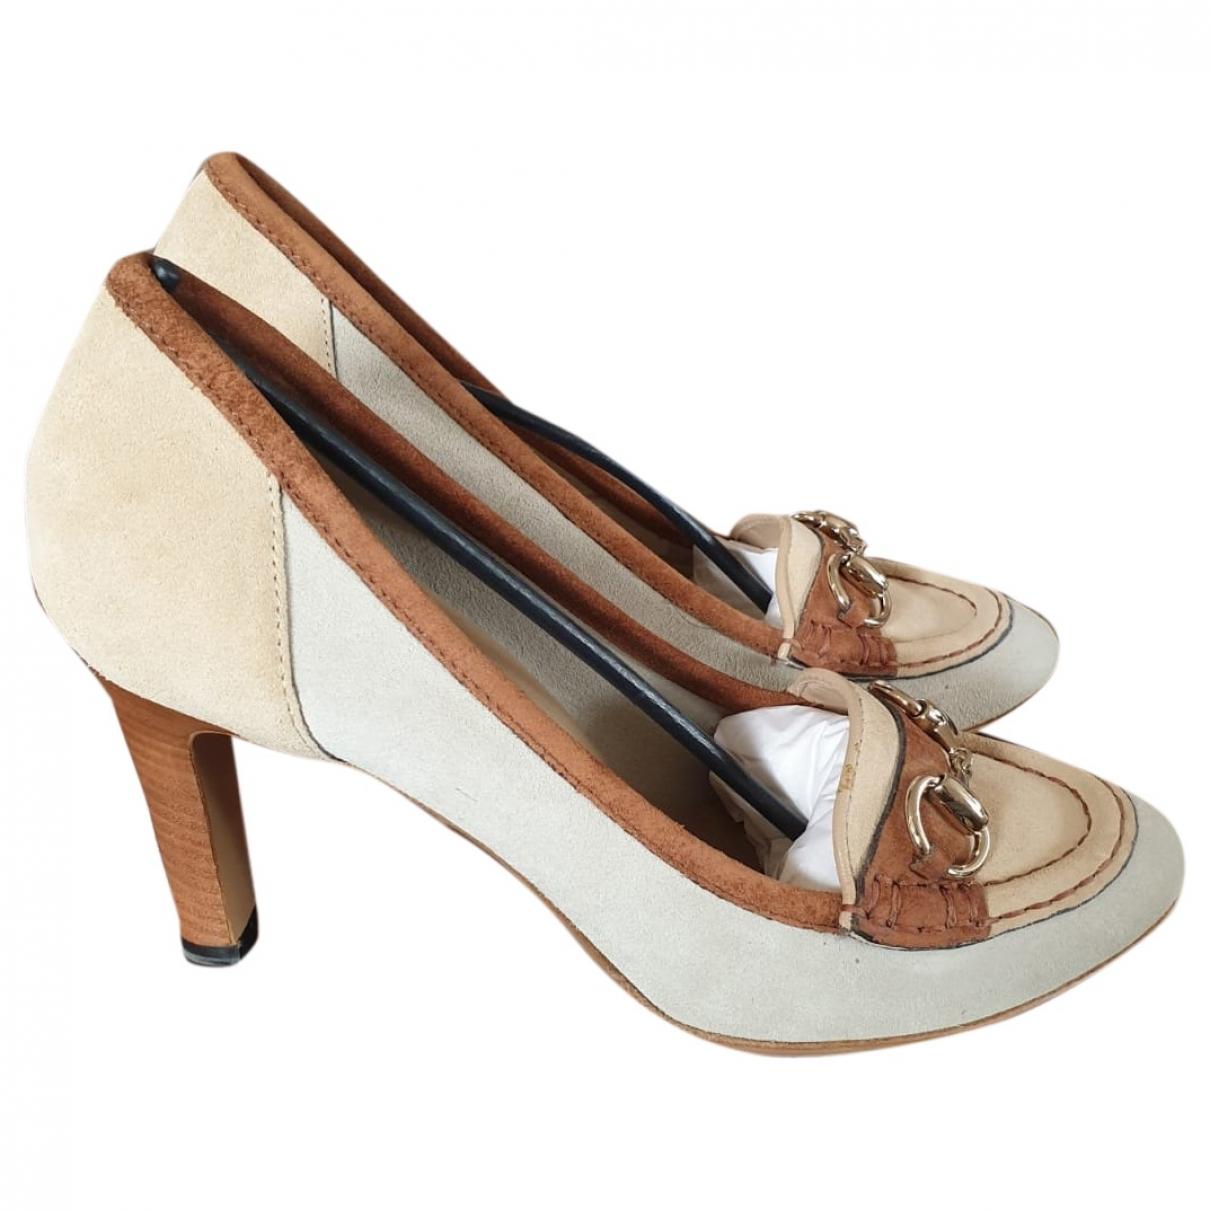 Gucci \N Beige Suede Heels for Women 36.5 EU